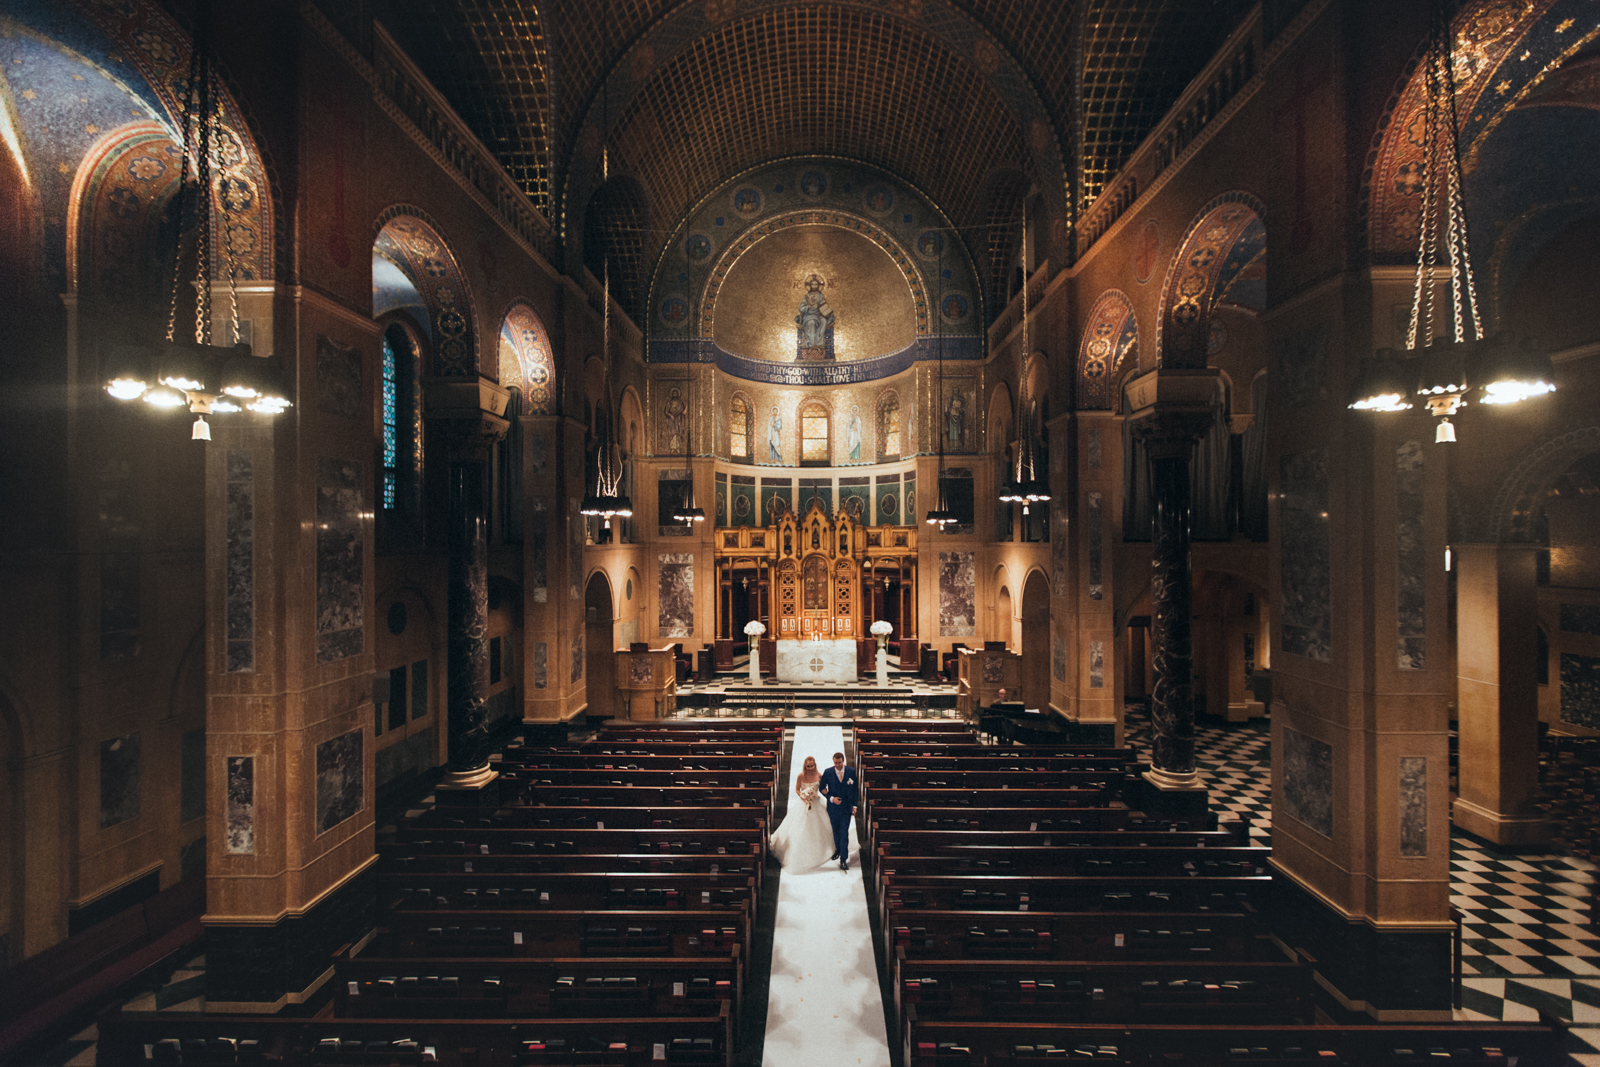 NYC Wedding Photography Sofitel Central Park Brooklyn Photographer Boris Zaretsky _B2C2414-Edit.jpg